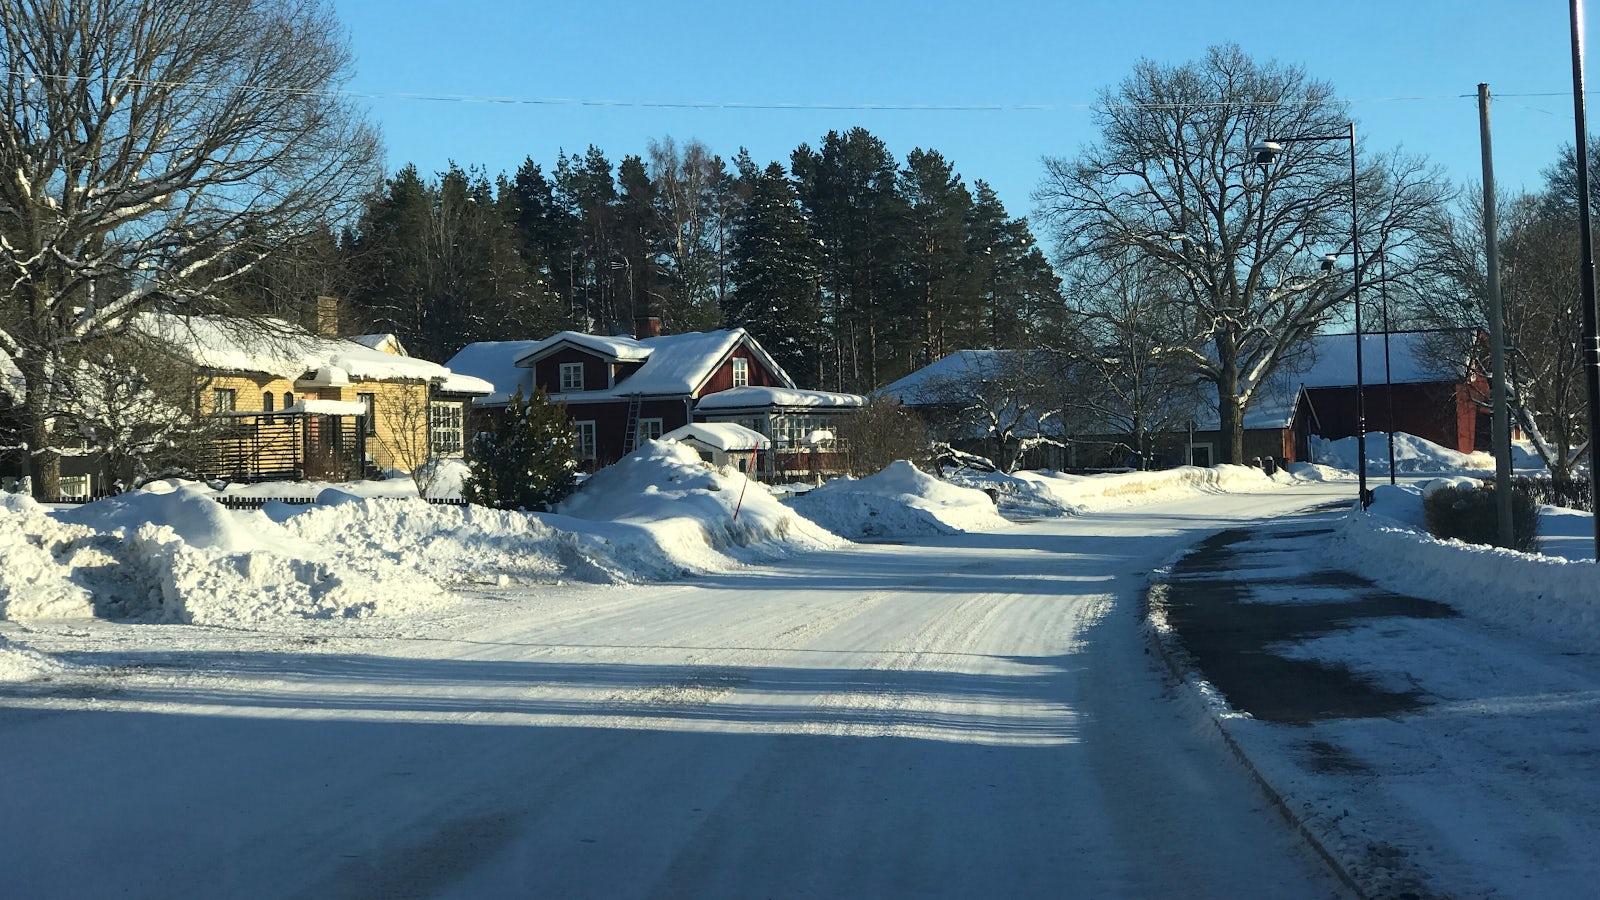 Vinterväglag i tätbebyggt område.